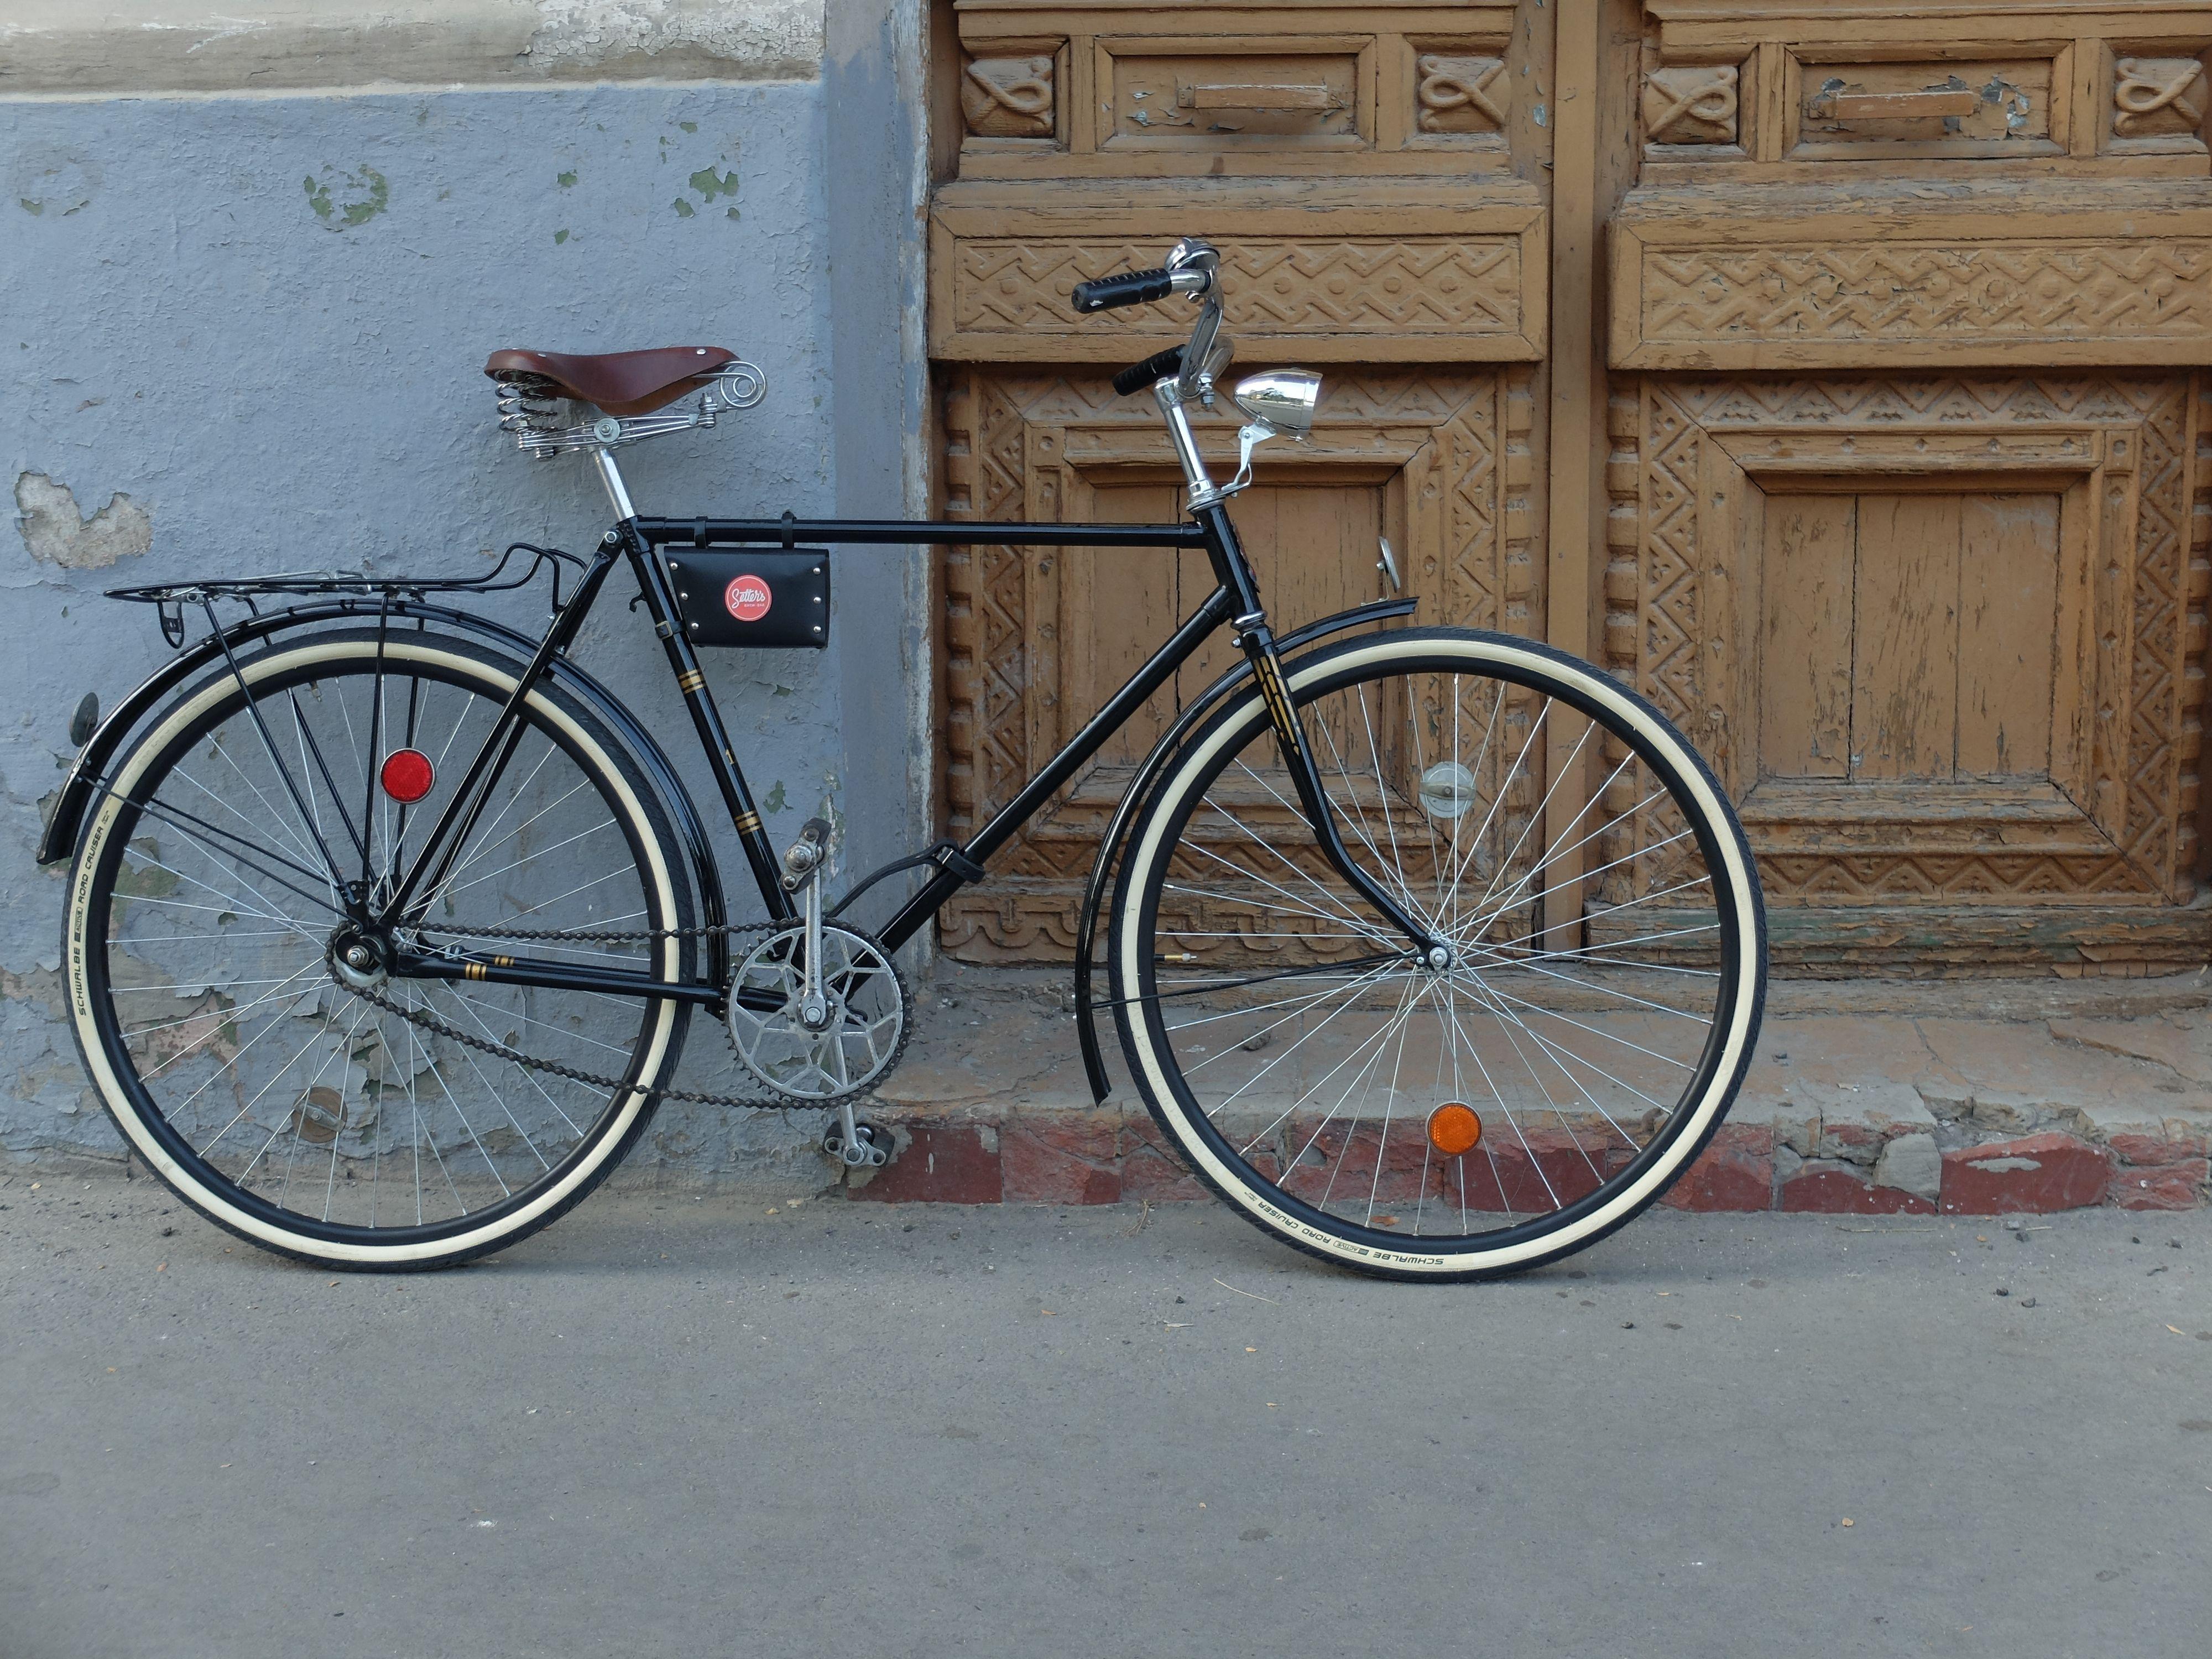 Old Bicycle Ukraina Bicycle Old Bicycle Retro Bicycle